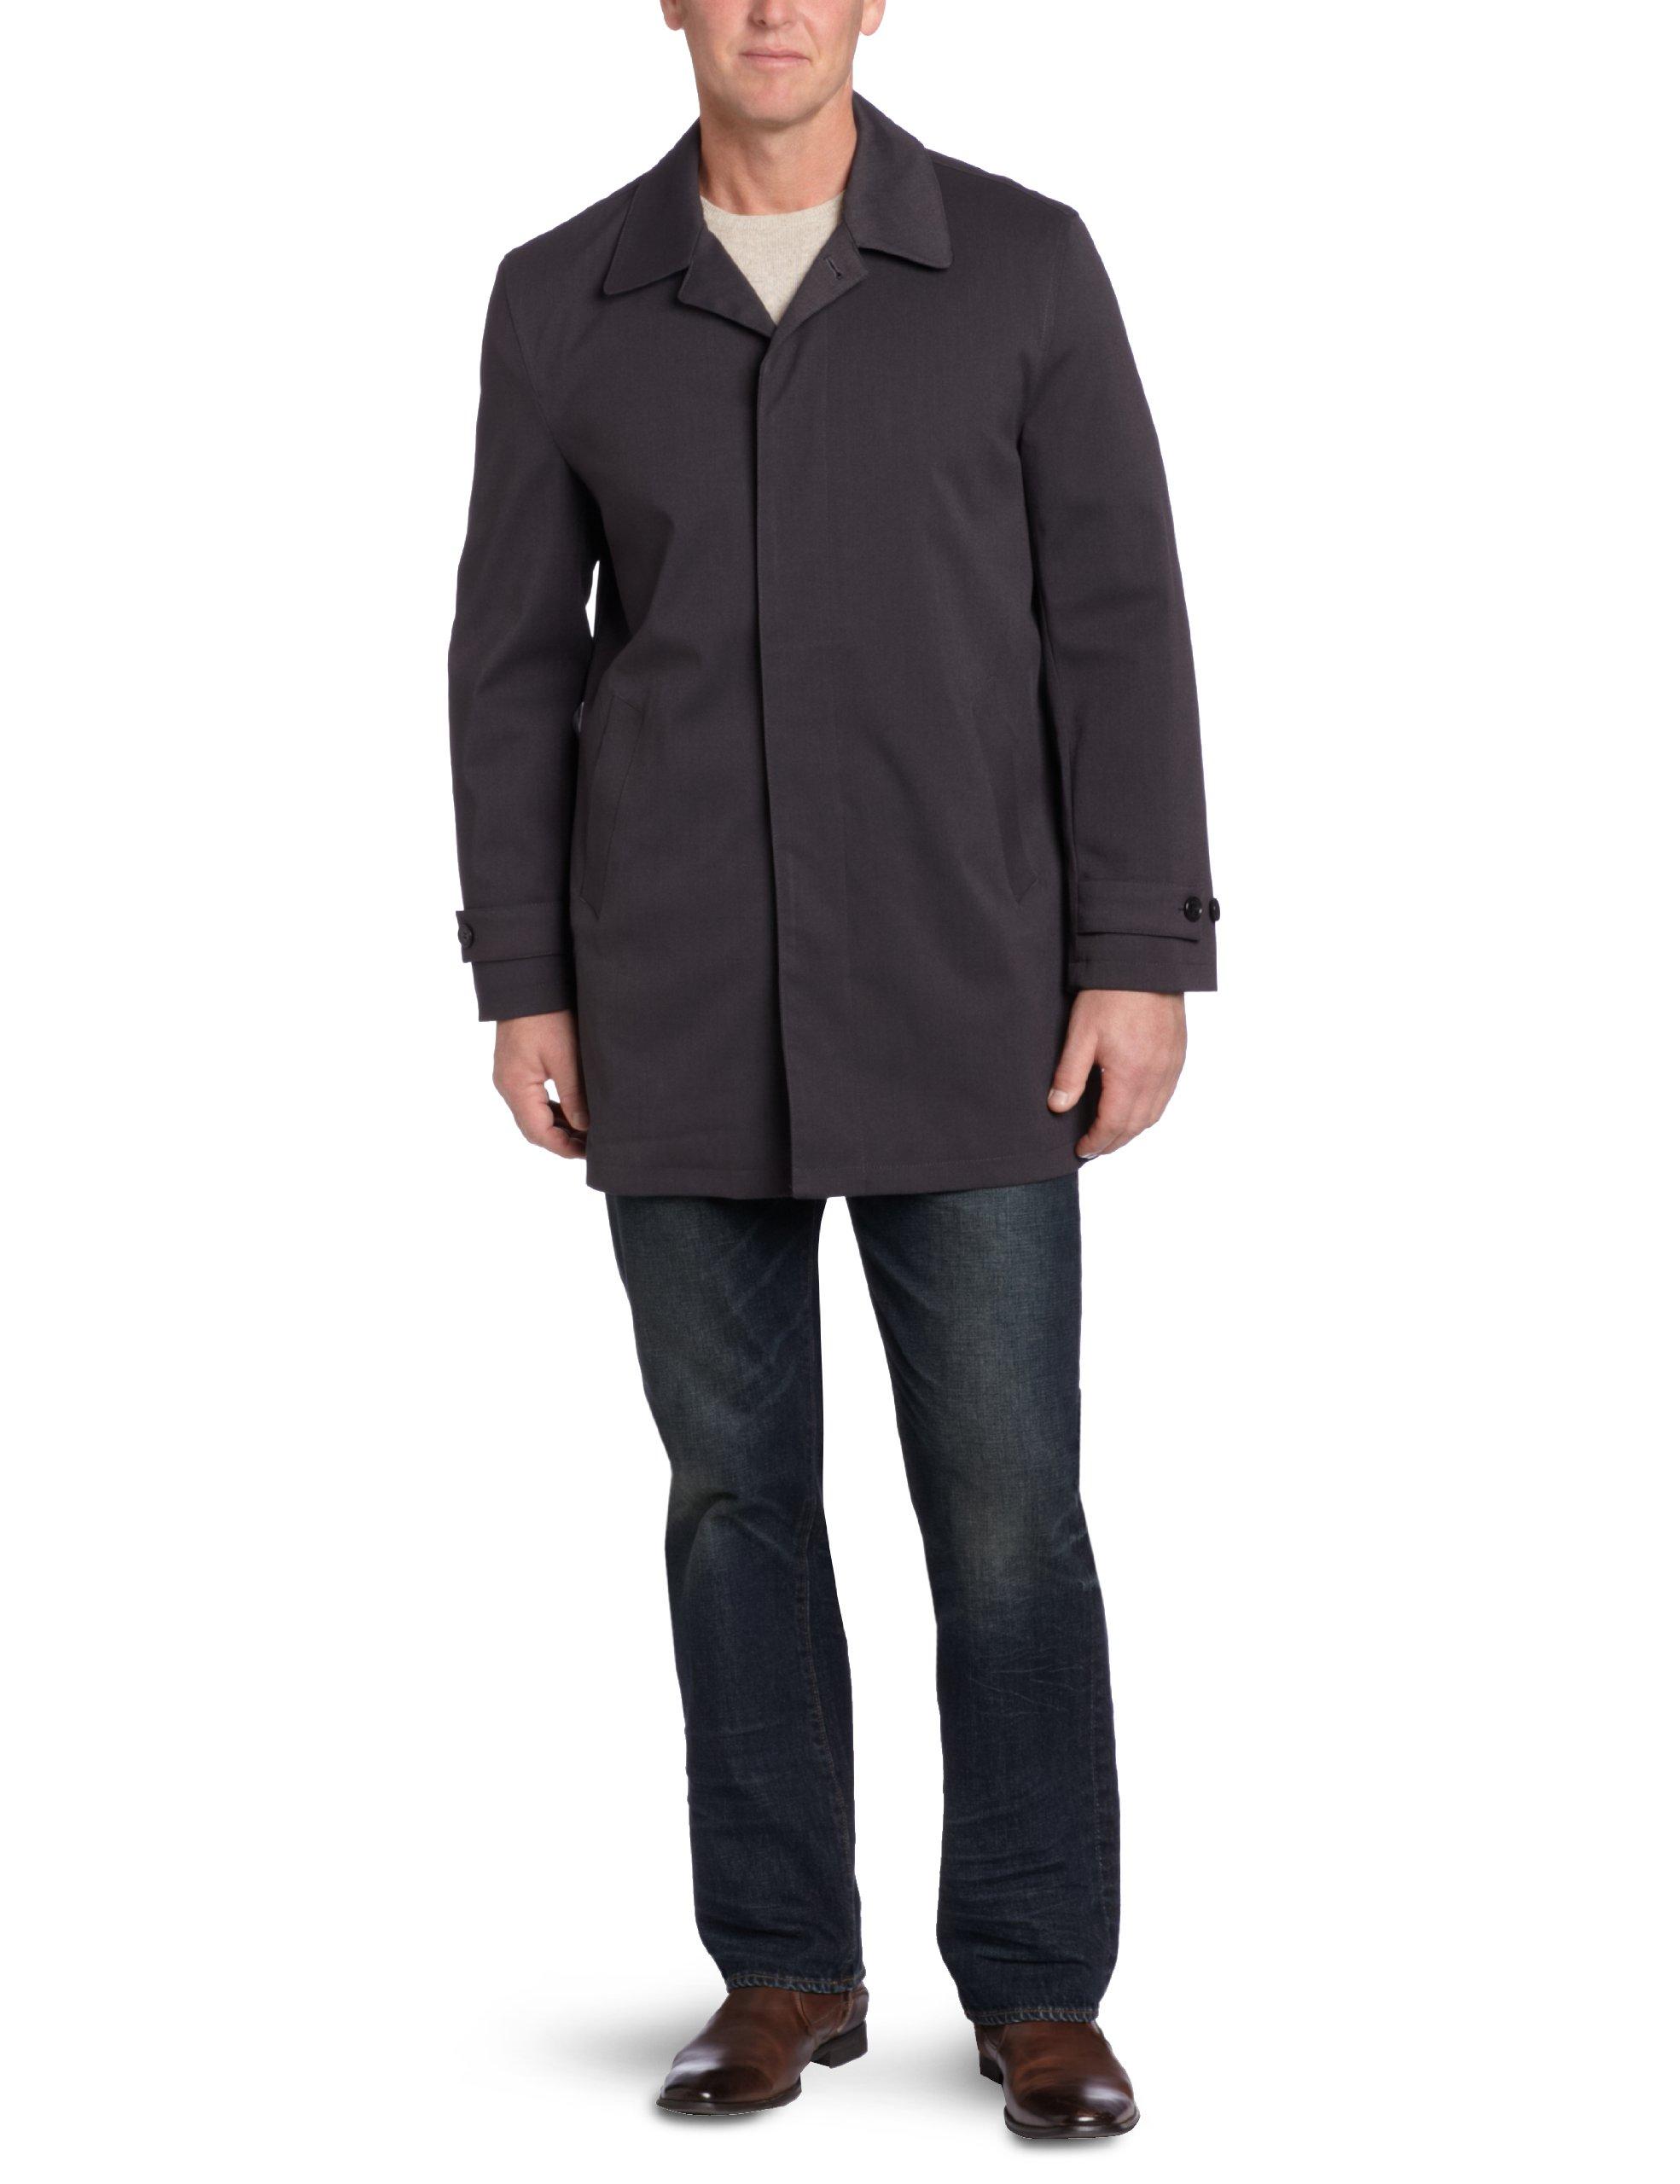 Michael Kors Men's Patterson Rain Coat, Charcoal/Black, 46 Regular by Michael Kors